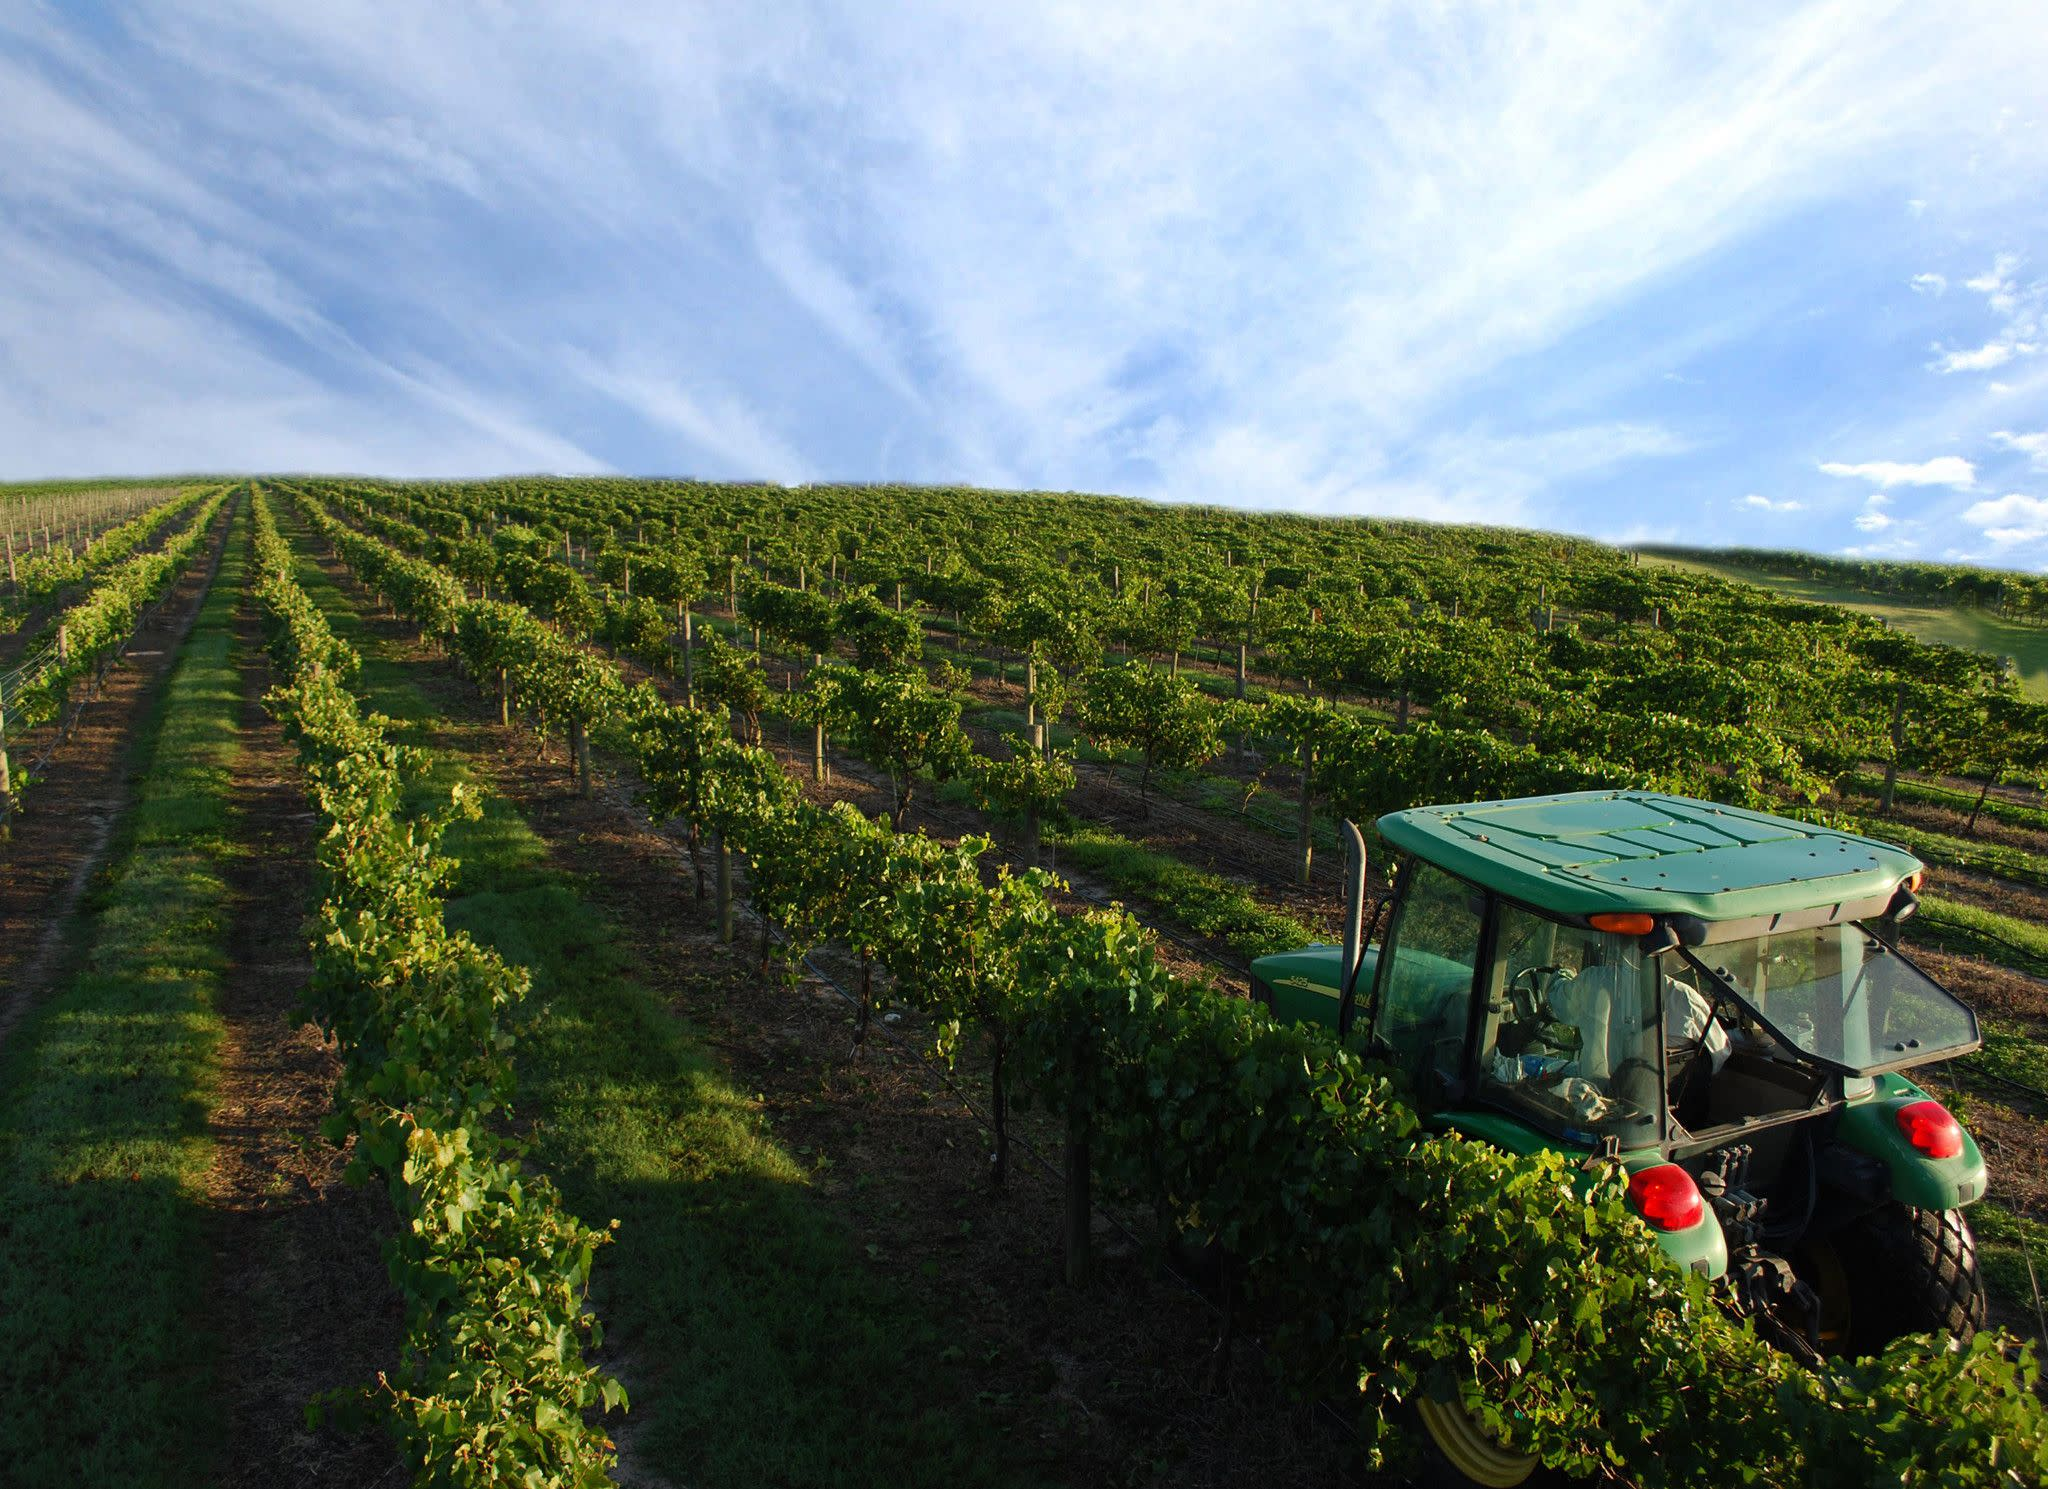 Lakeridge Winery & Vineyards in Clermont